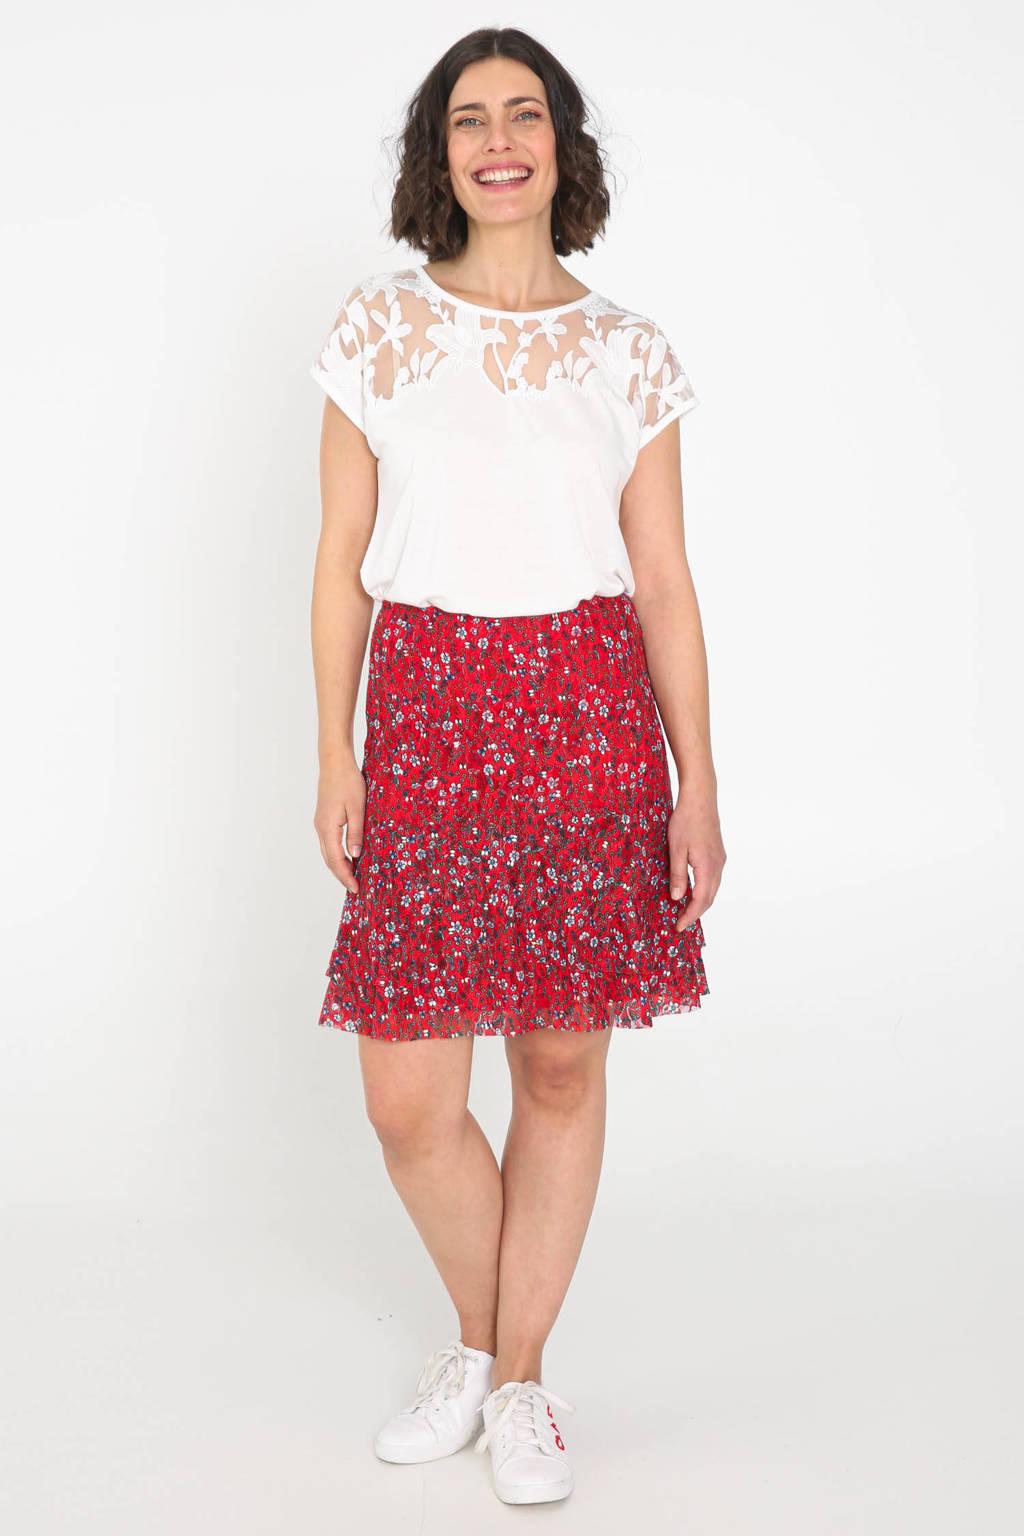 Cassis gebloemde semi-transparante rok rood/wit/donkerblauw, Rood/wit/donkerblauw